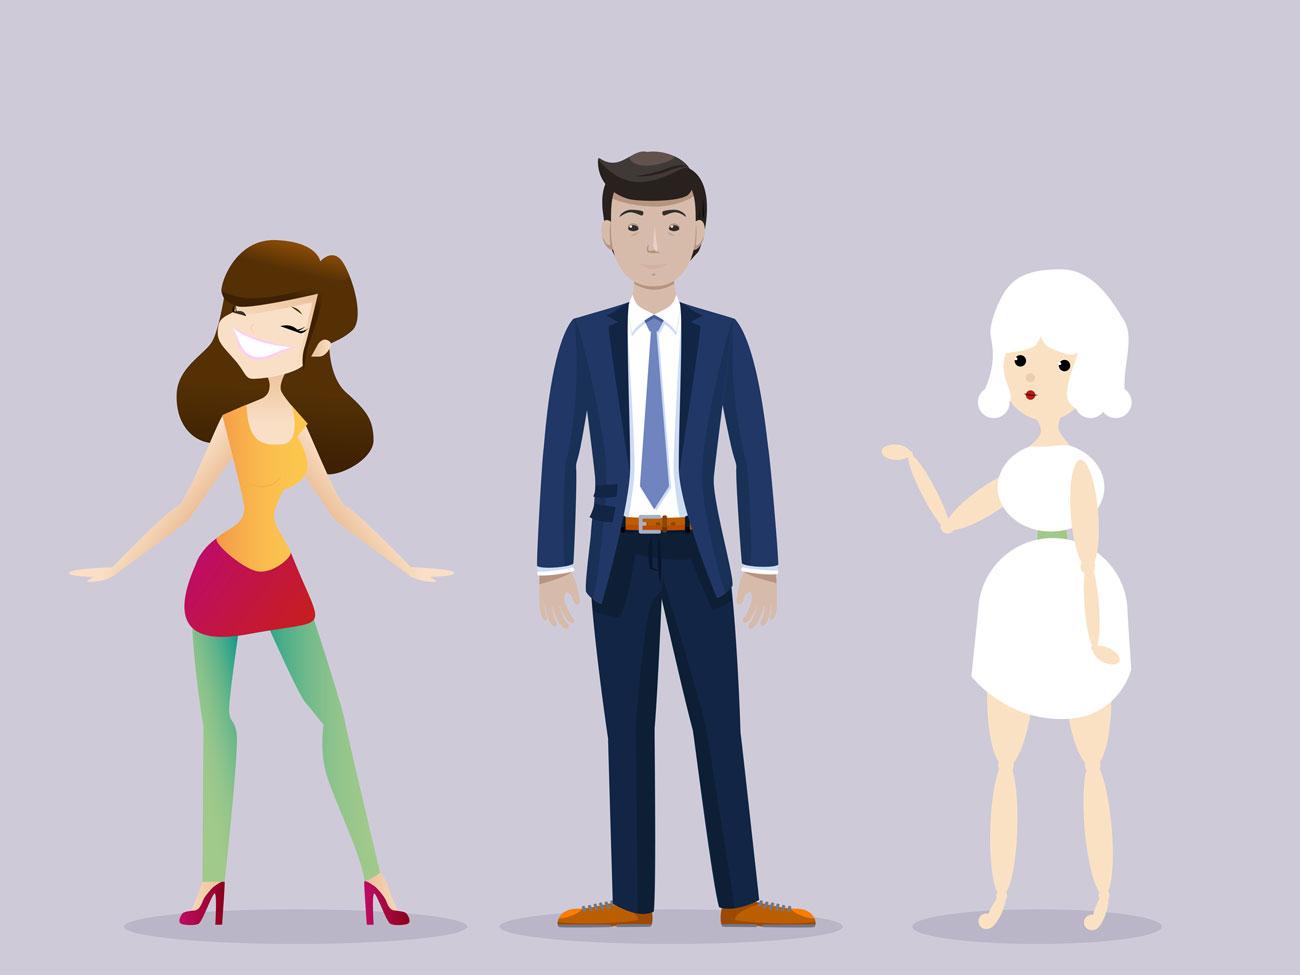 Charakterdesign Frau, Mann und Frau Holle